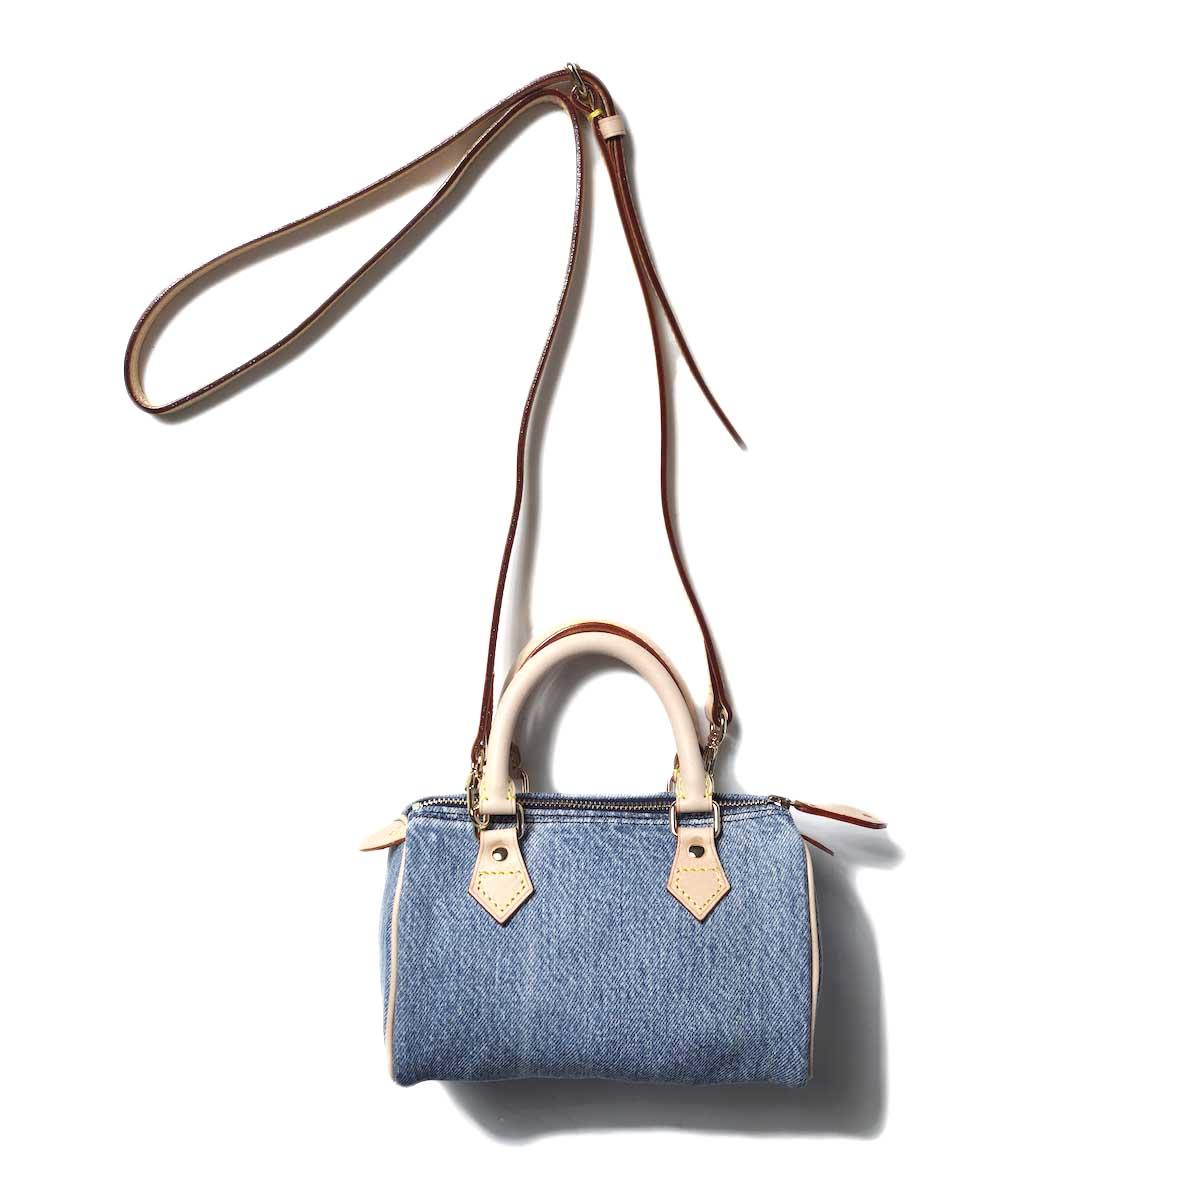 UNUSED / UH0559 Denim Shoulder Bag (indido) 全体